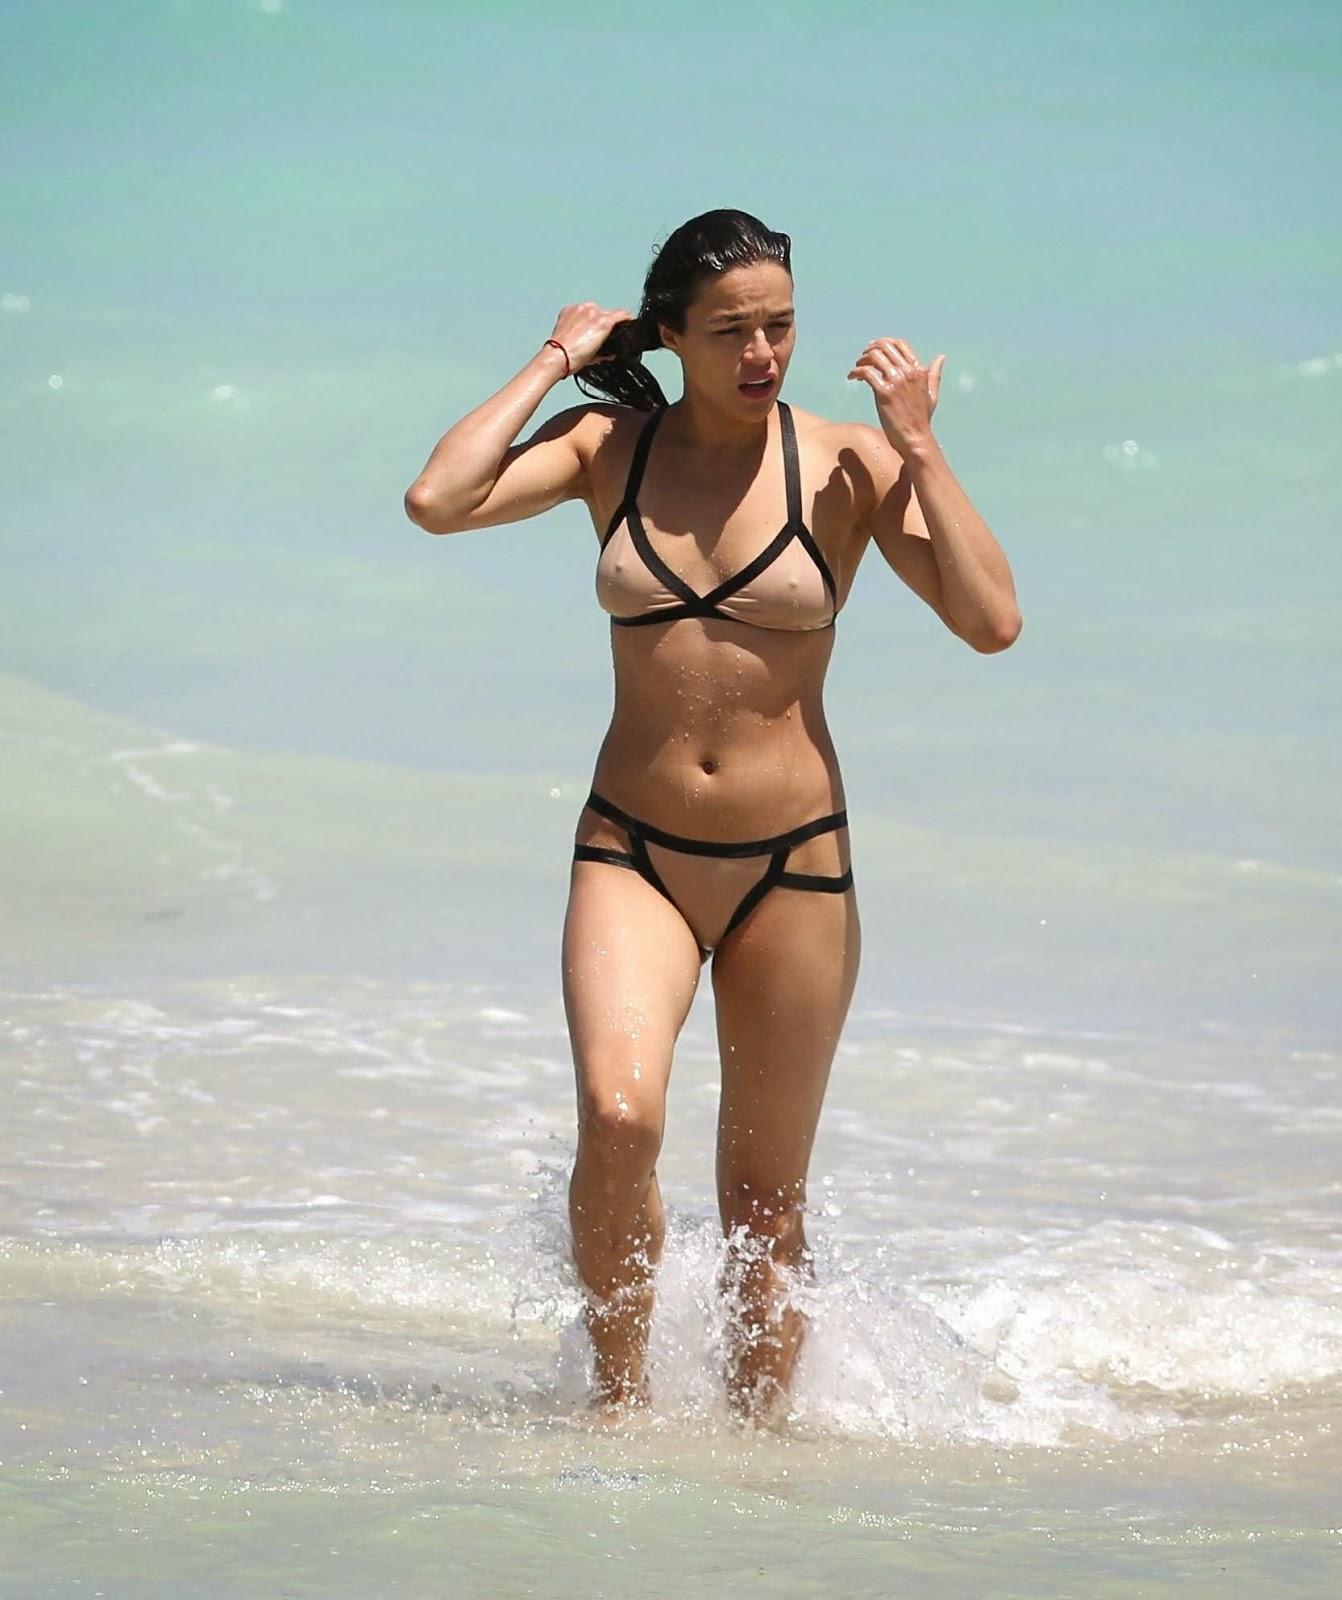 Michelle Rodriguez Bikini Bodies Pic 30 of 35